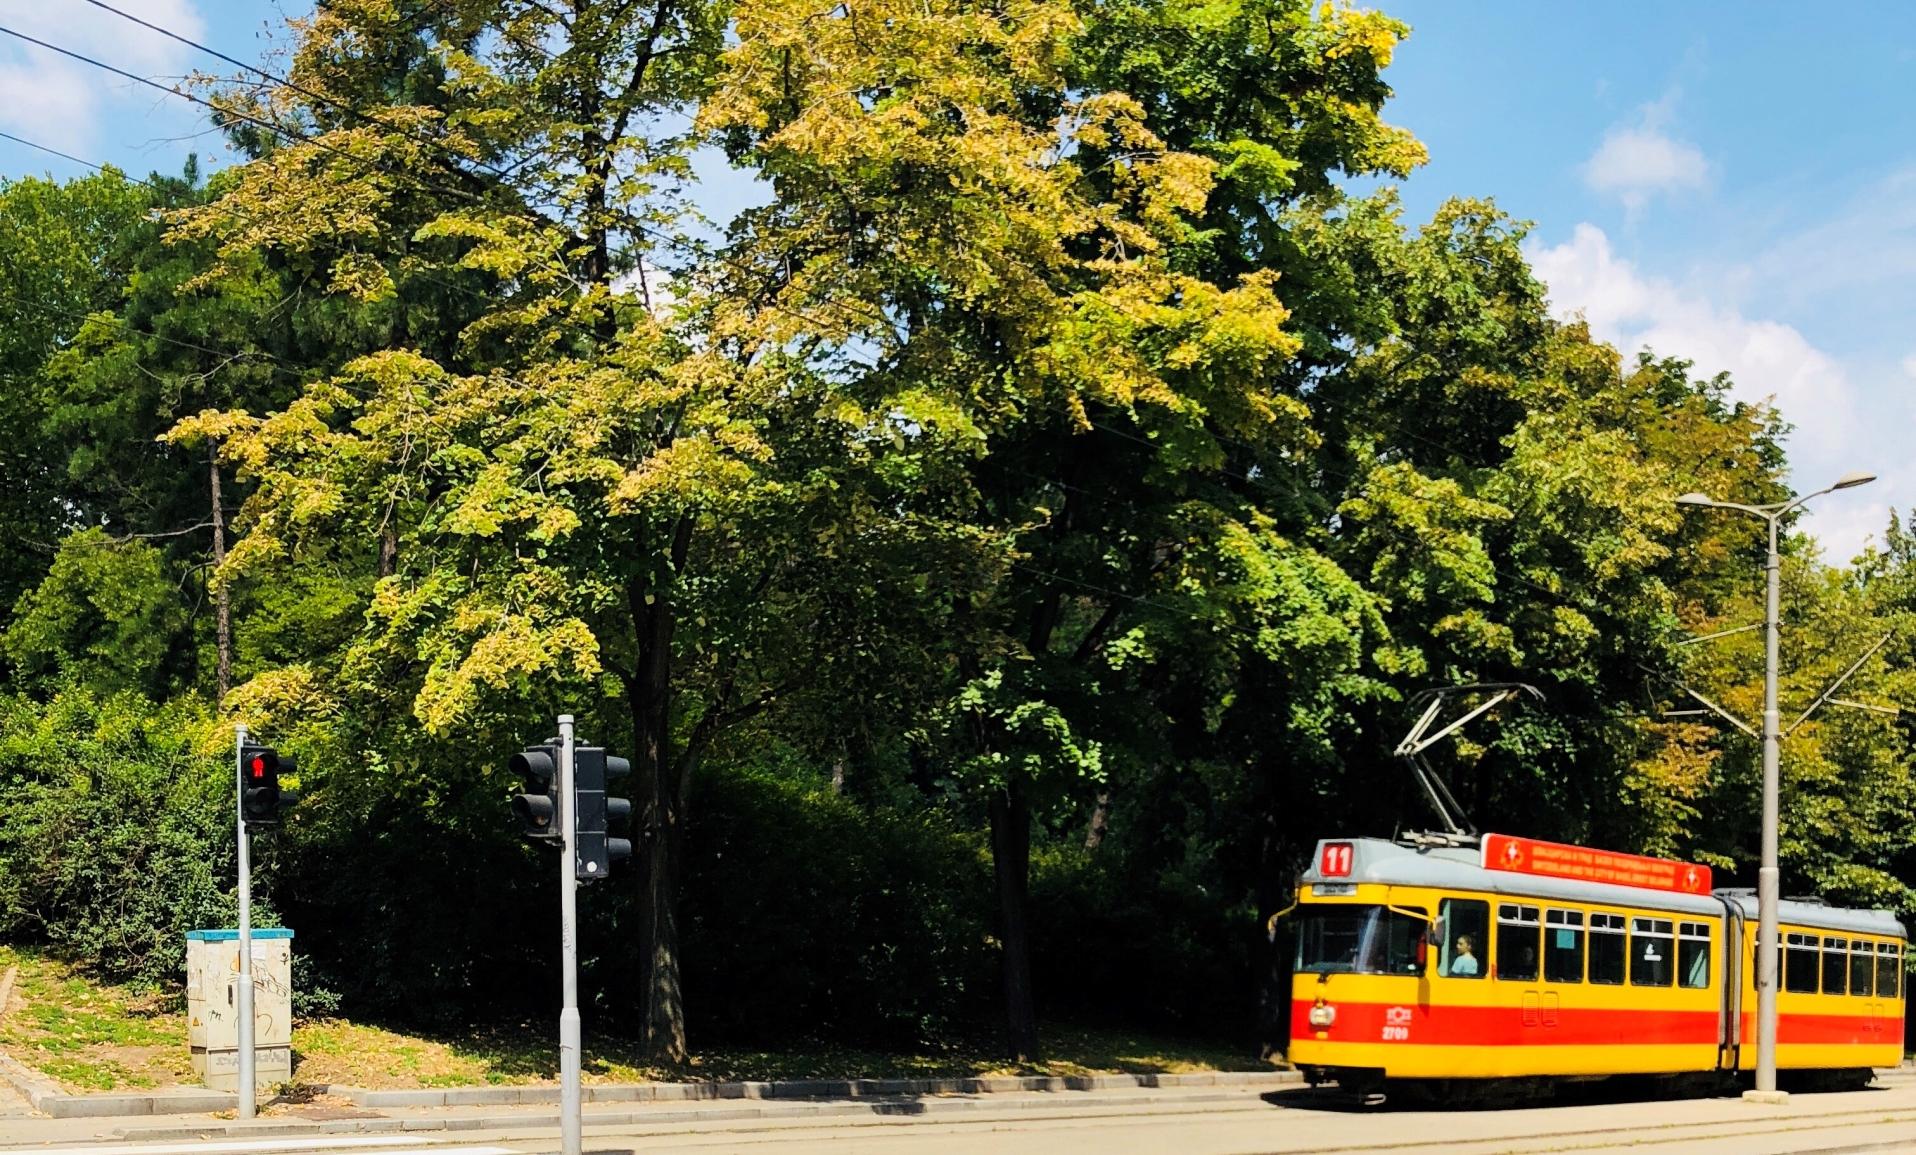 theashtreejournal belgrade trams